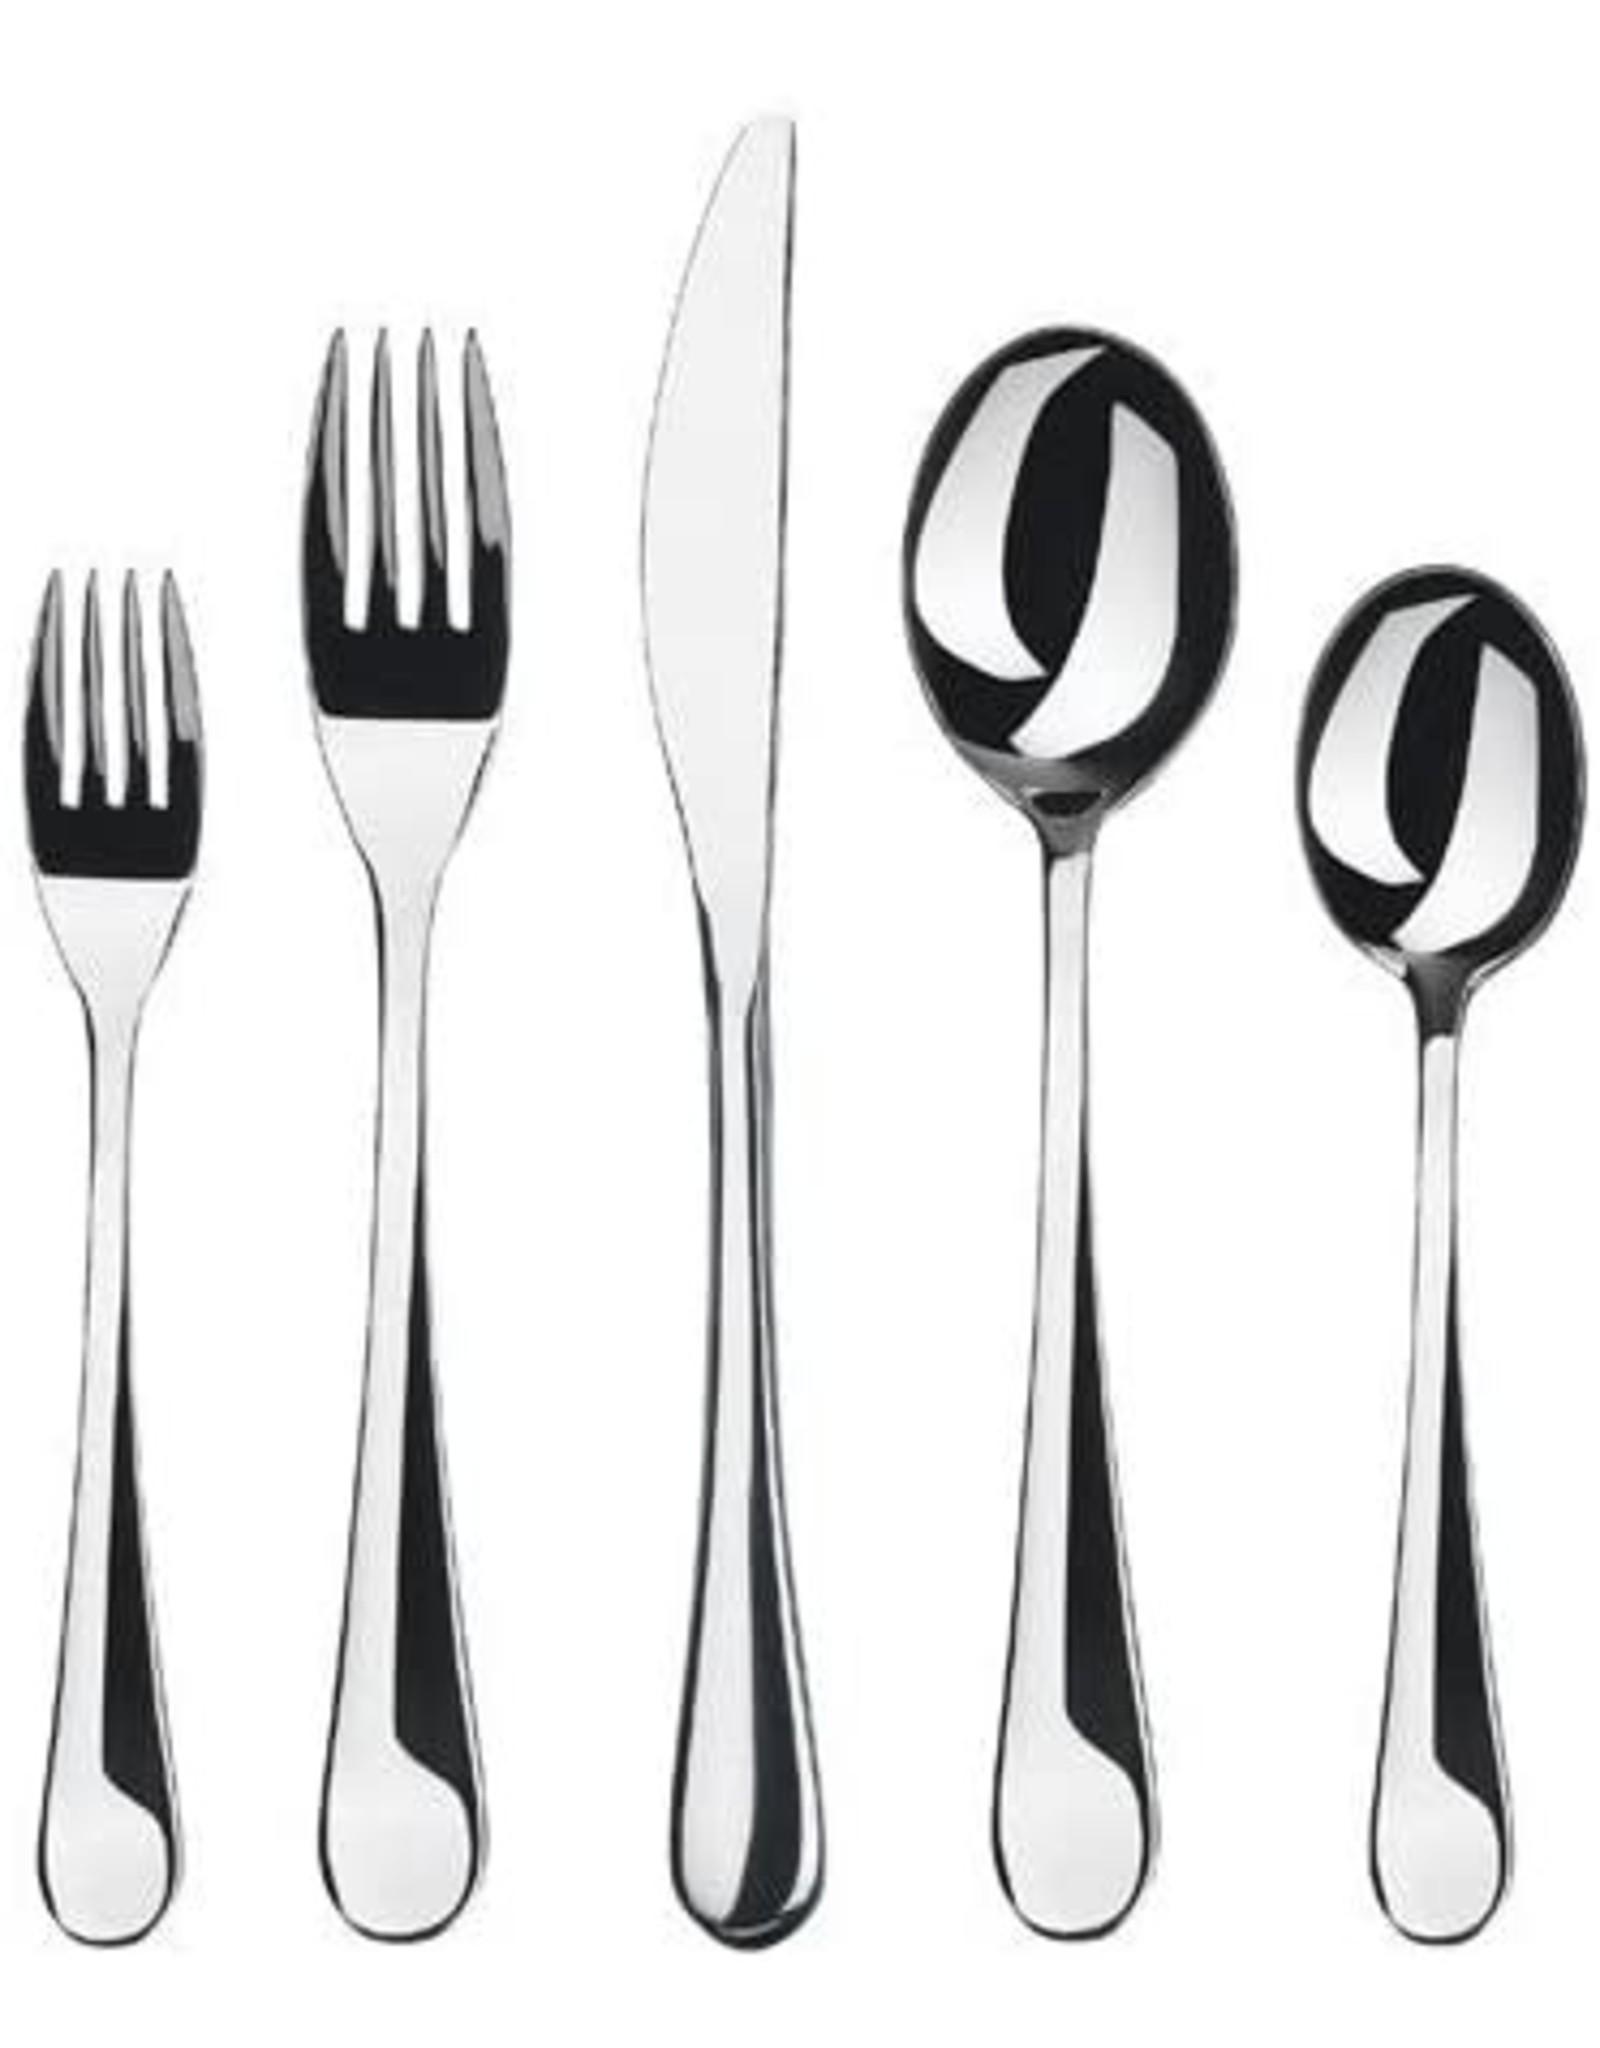 Gourmet Settings - Windermere 20pc Set